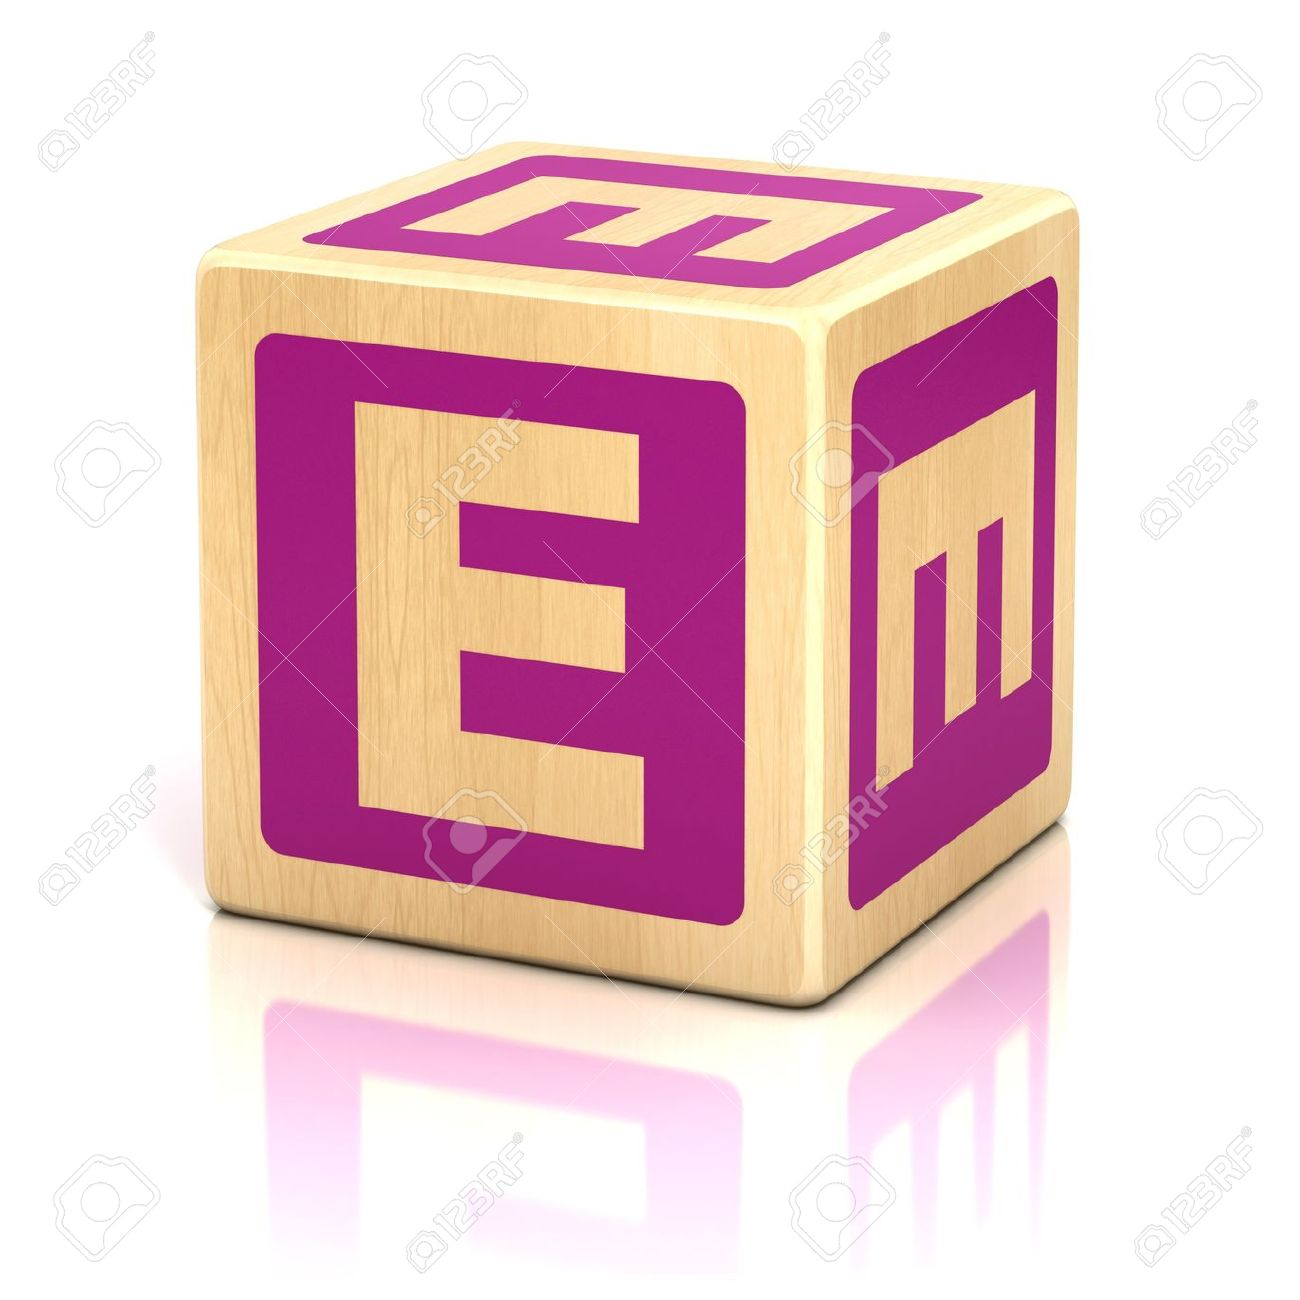 Sitcom allineare Non essenziale  Letter E Alphabet Cubes Font Stock Photo, Picture And Royalty Free ...